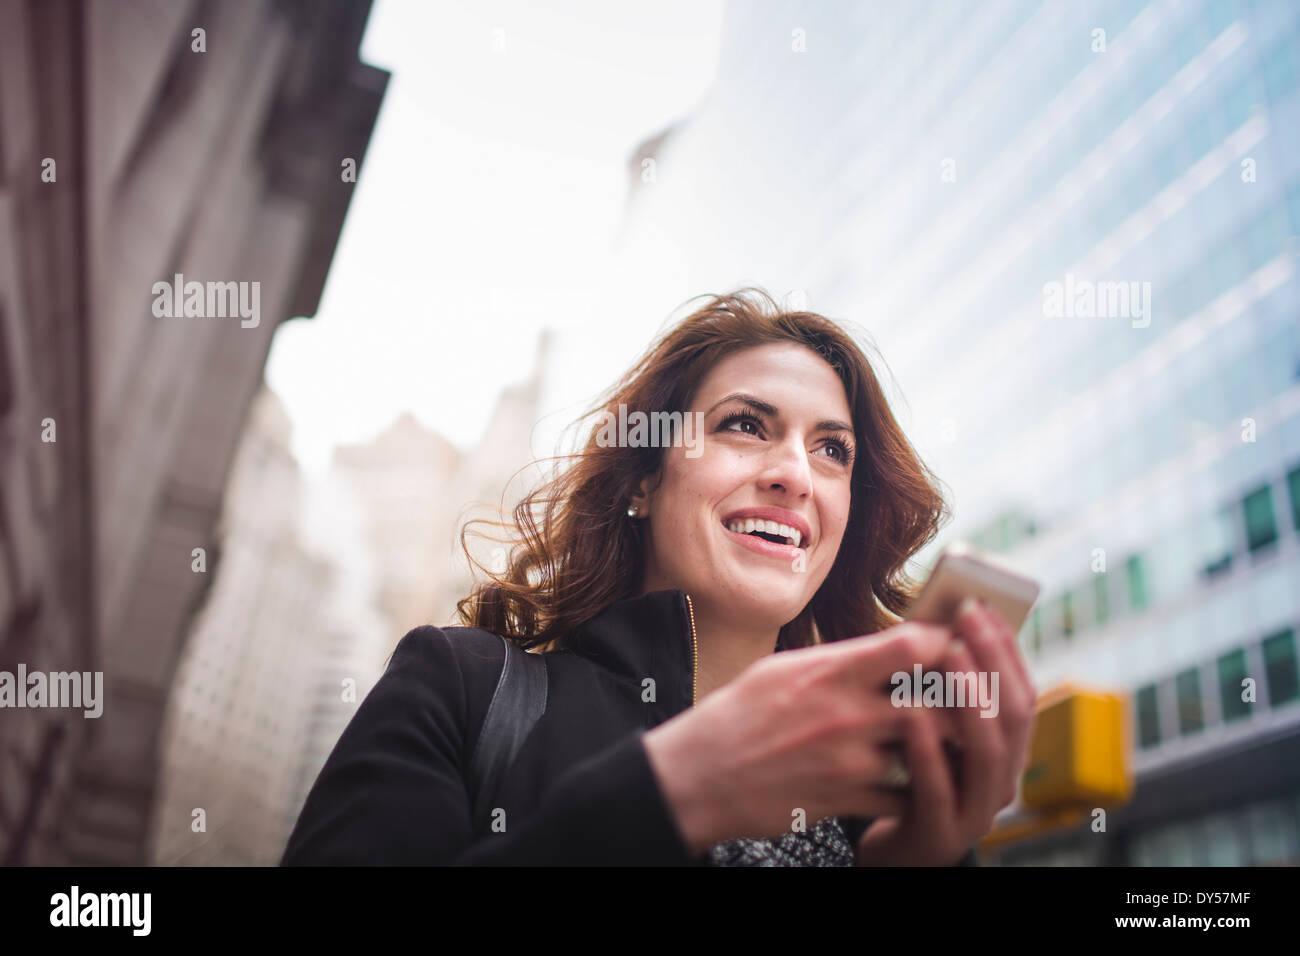 Junge Frau mit Handy, New York, USA Stockbild